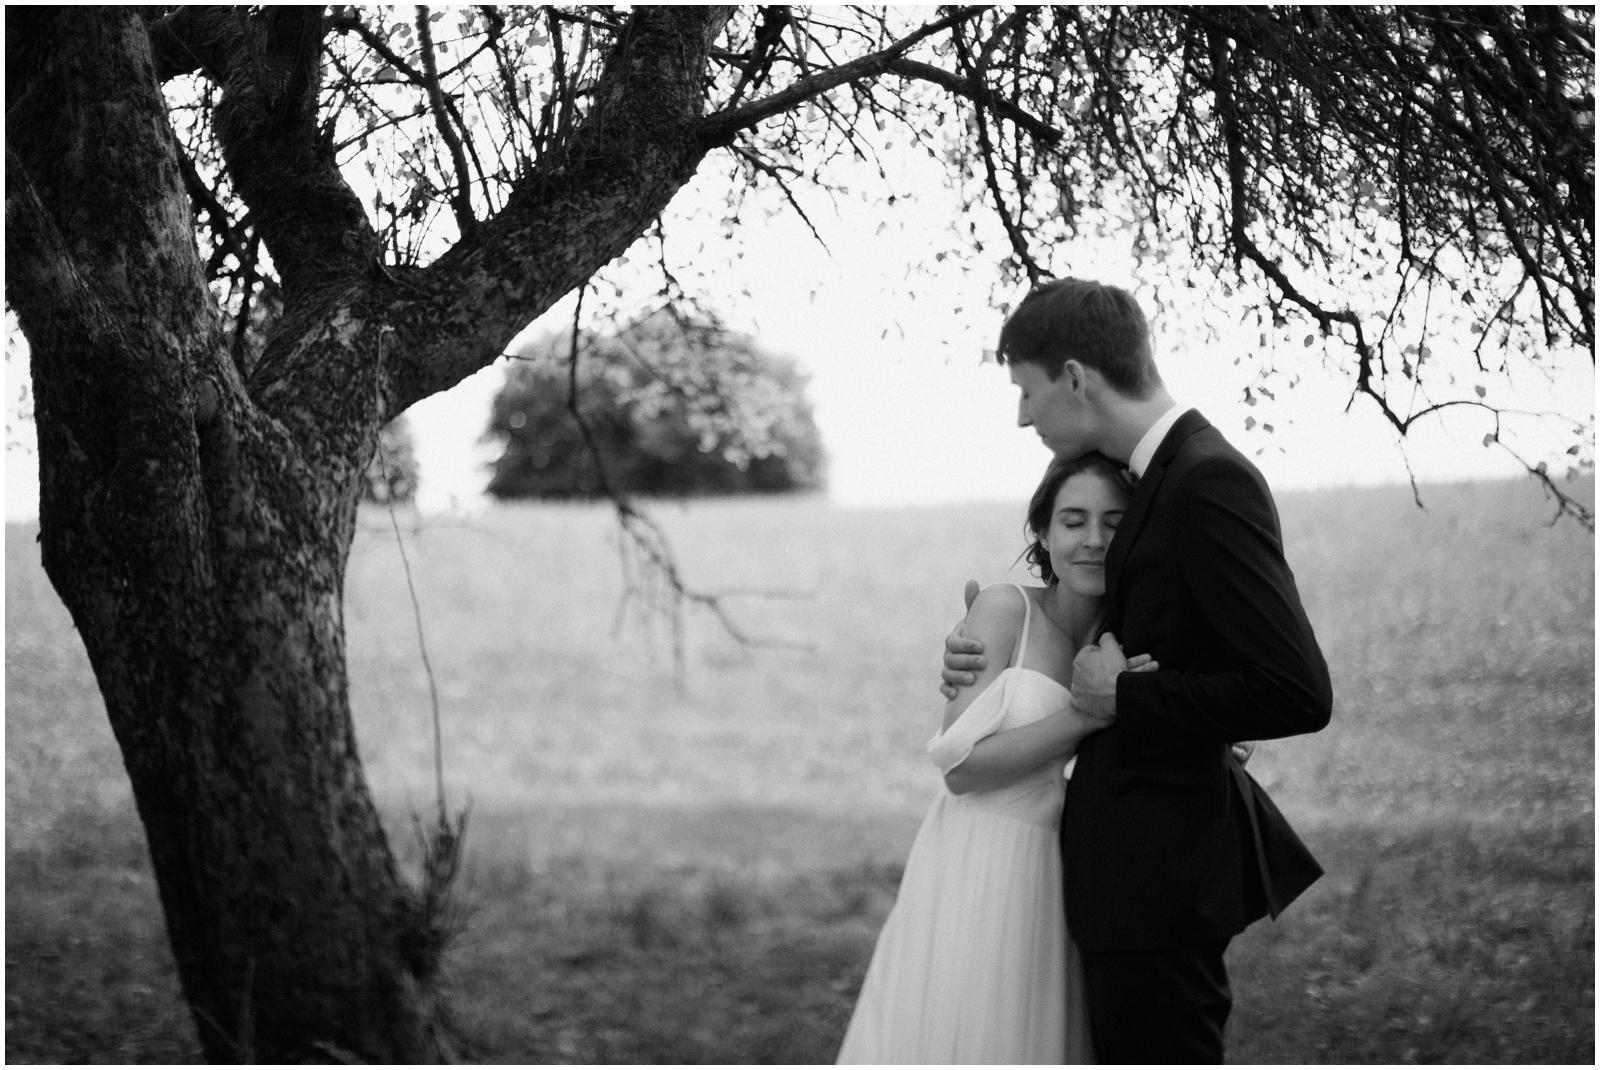 mirjam_thomas_wedding-169-2.jpg